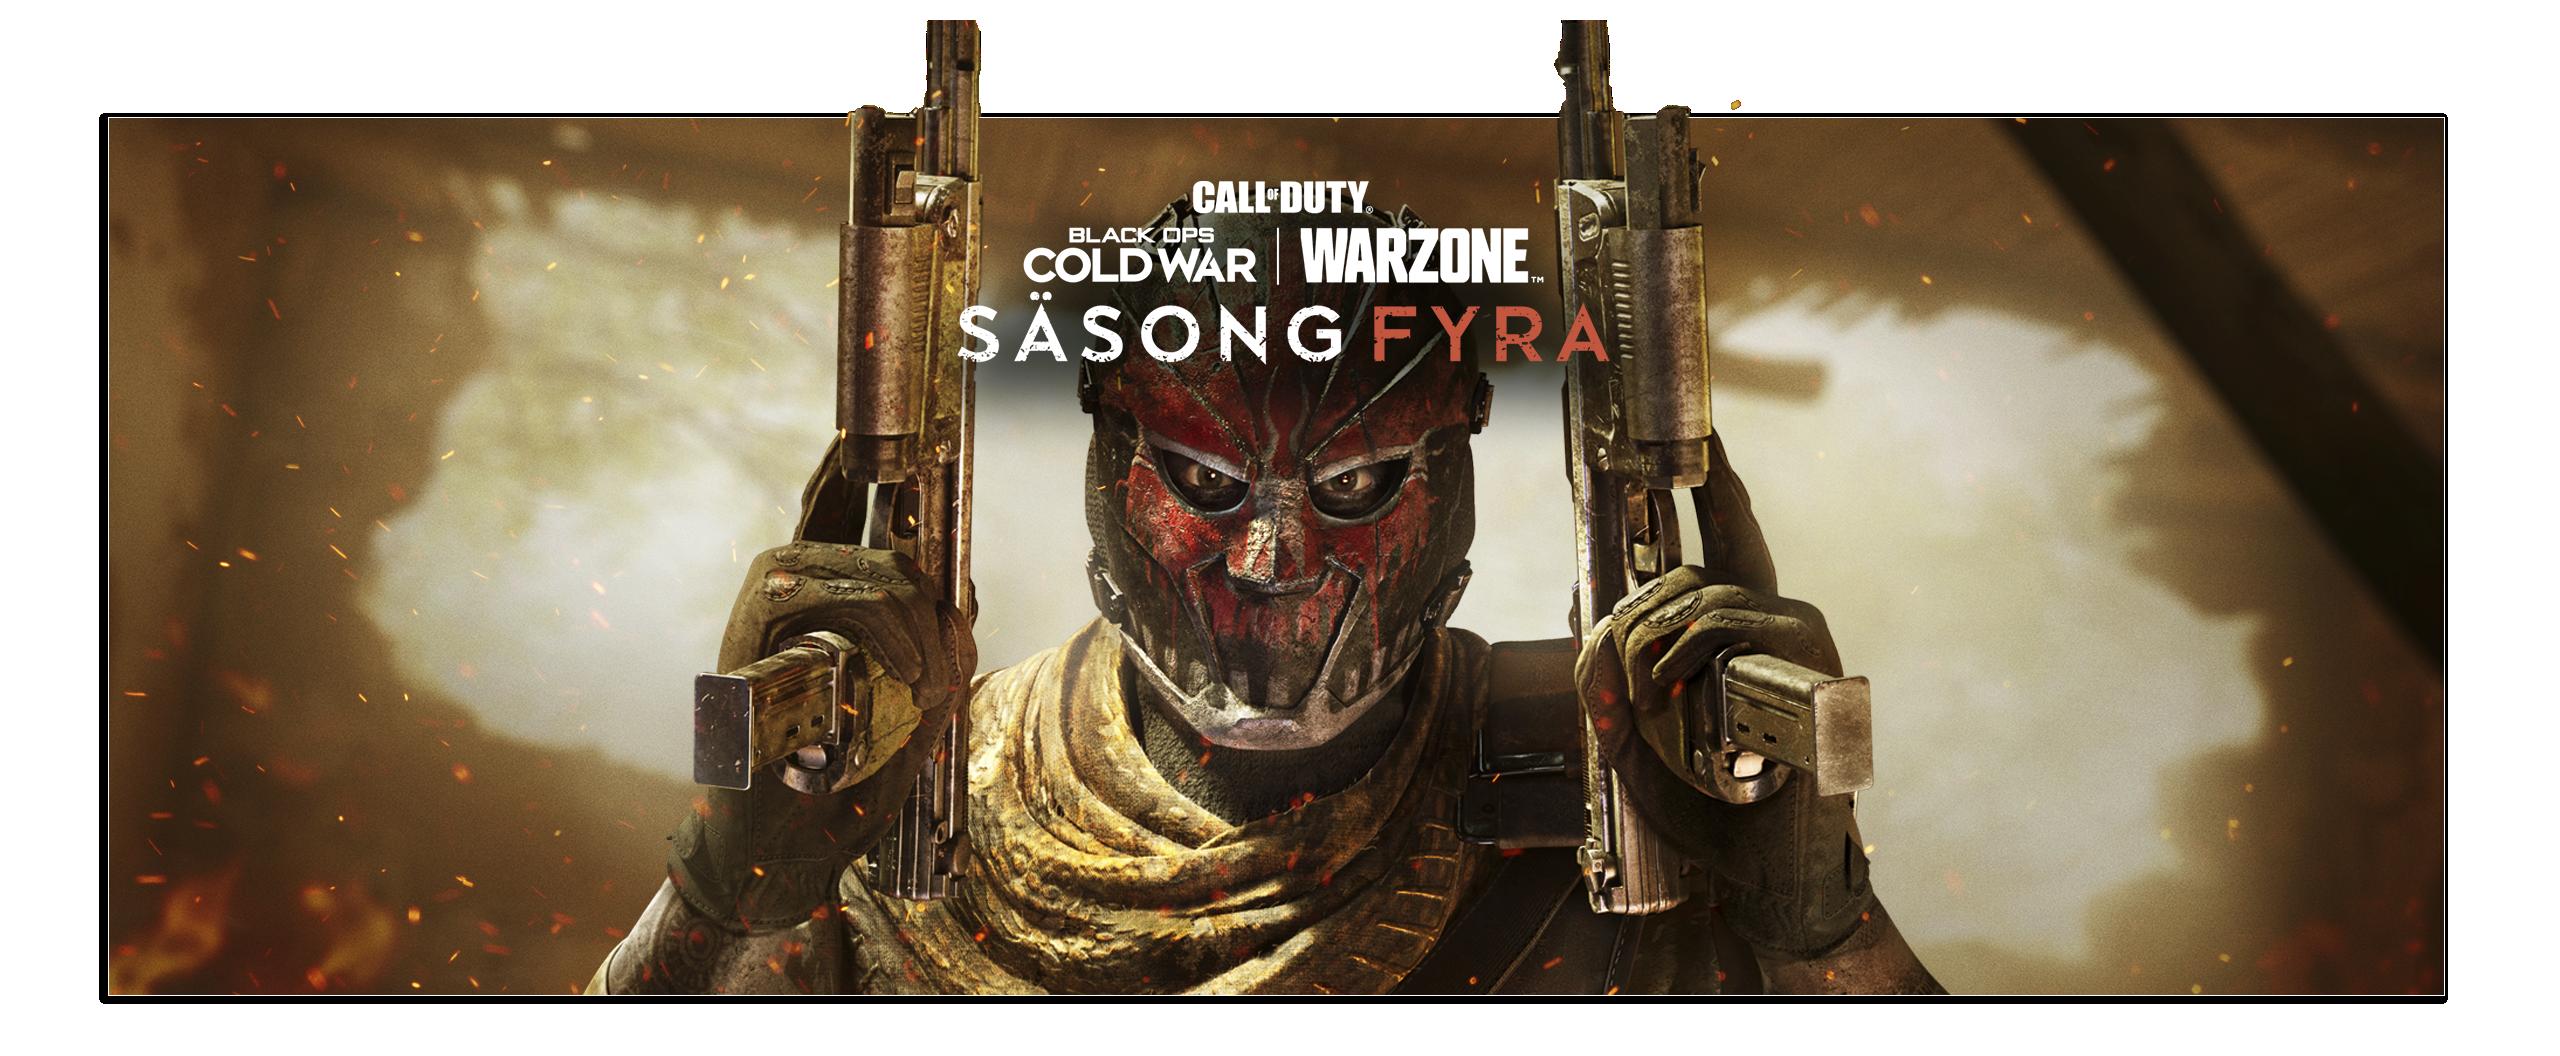 Call of Duty Black Ops Cold War Season 4 – bild